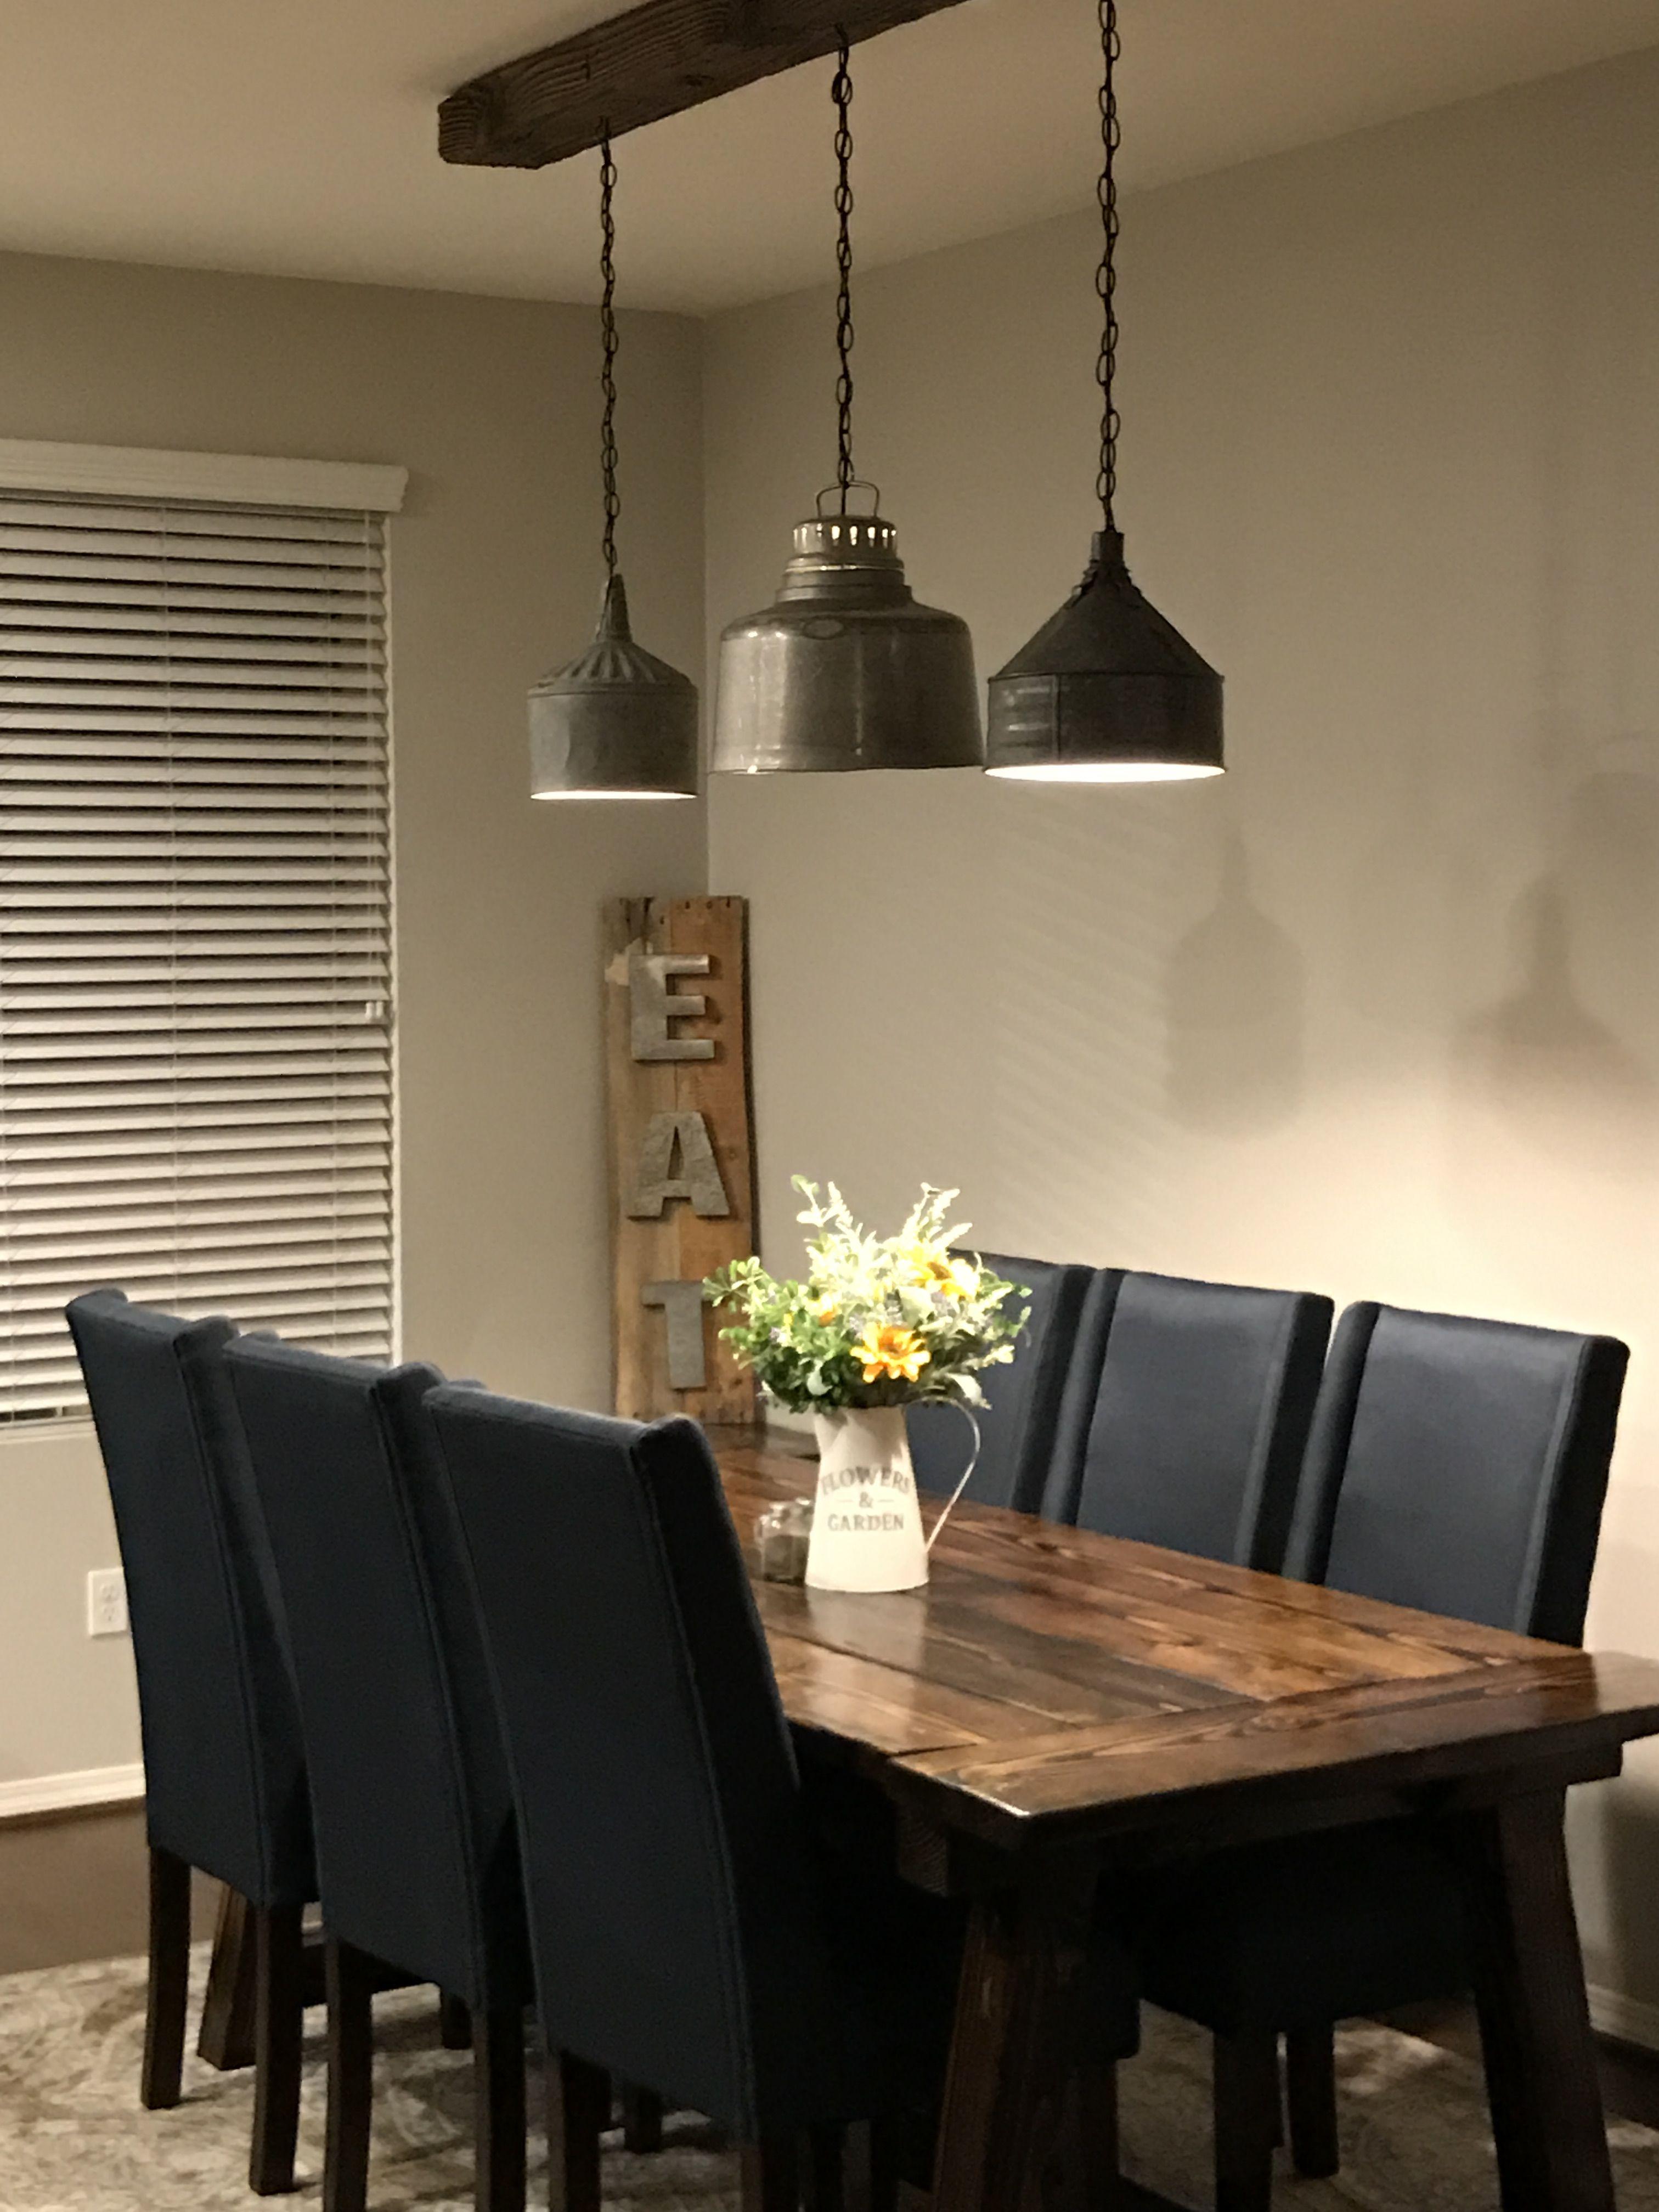 Rustic dining light farmhouse Dining lighting, Dining